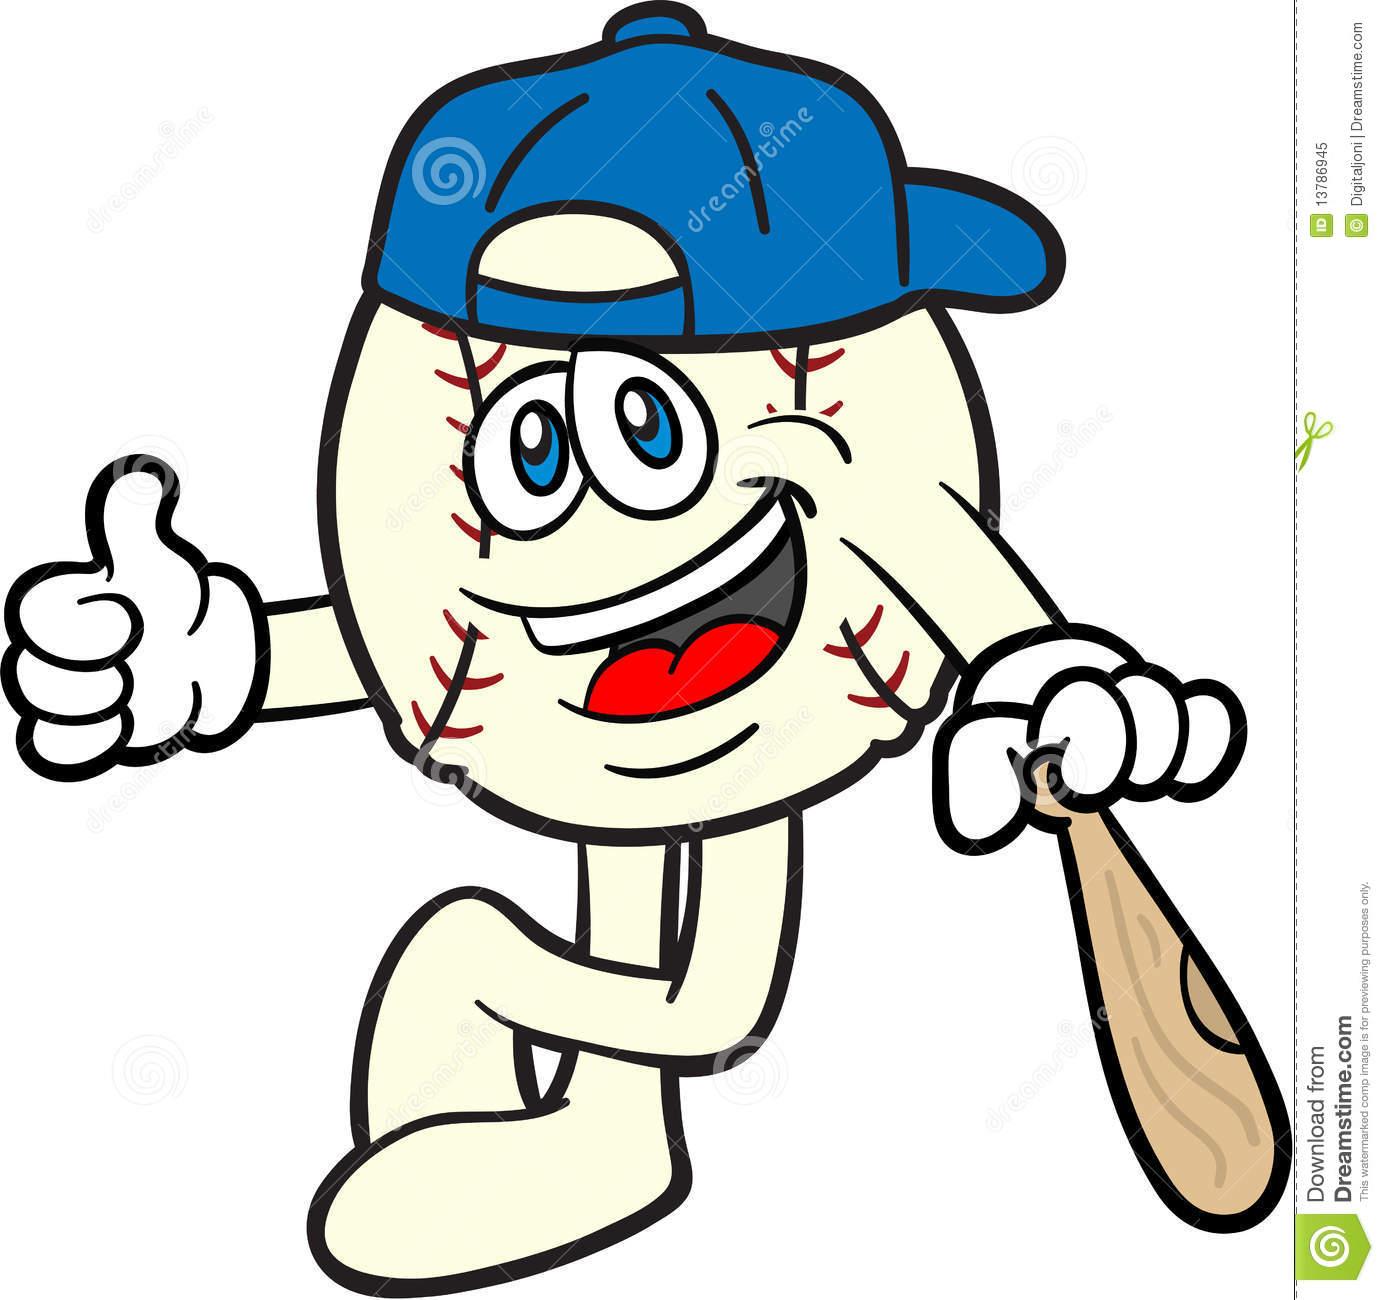 Baseball clipart cartoon. Delivered cartoons pictures impressive